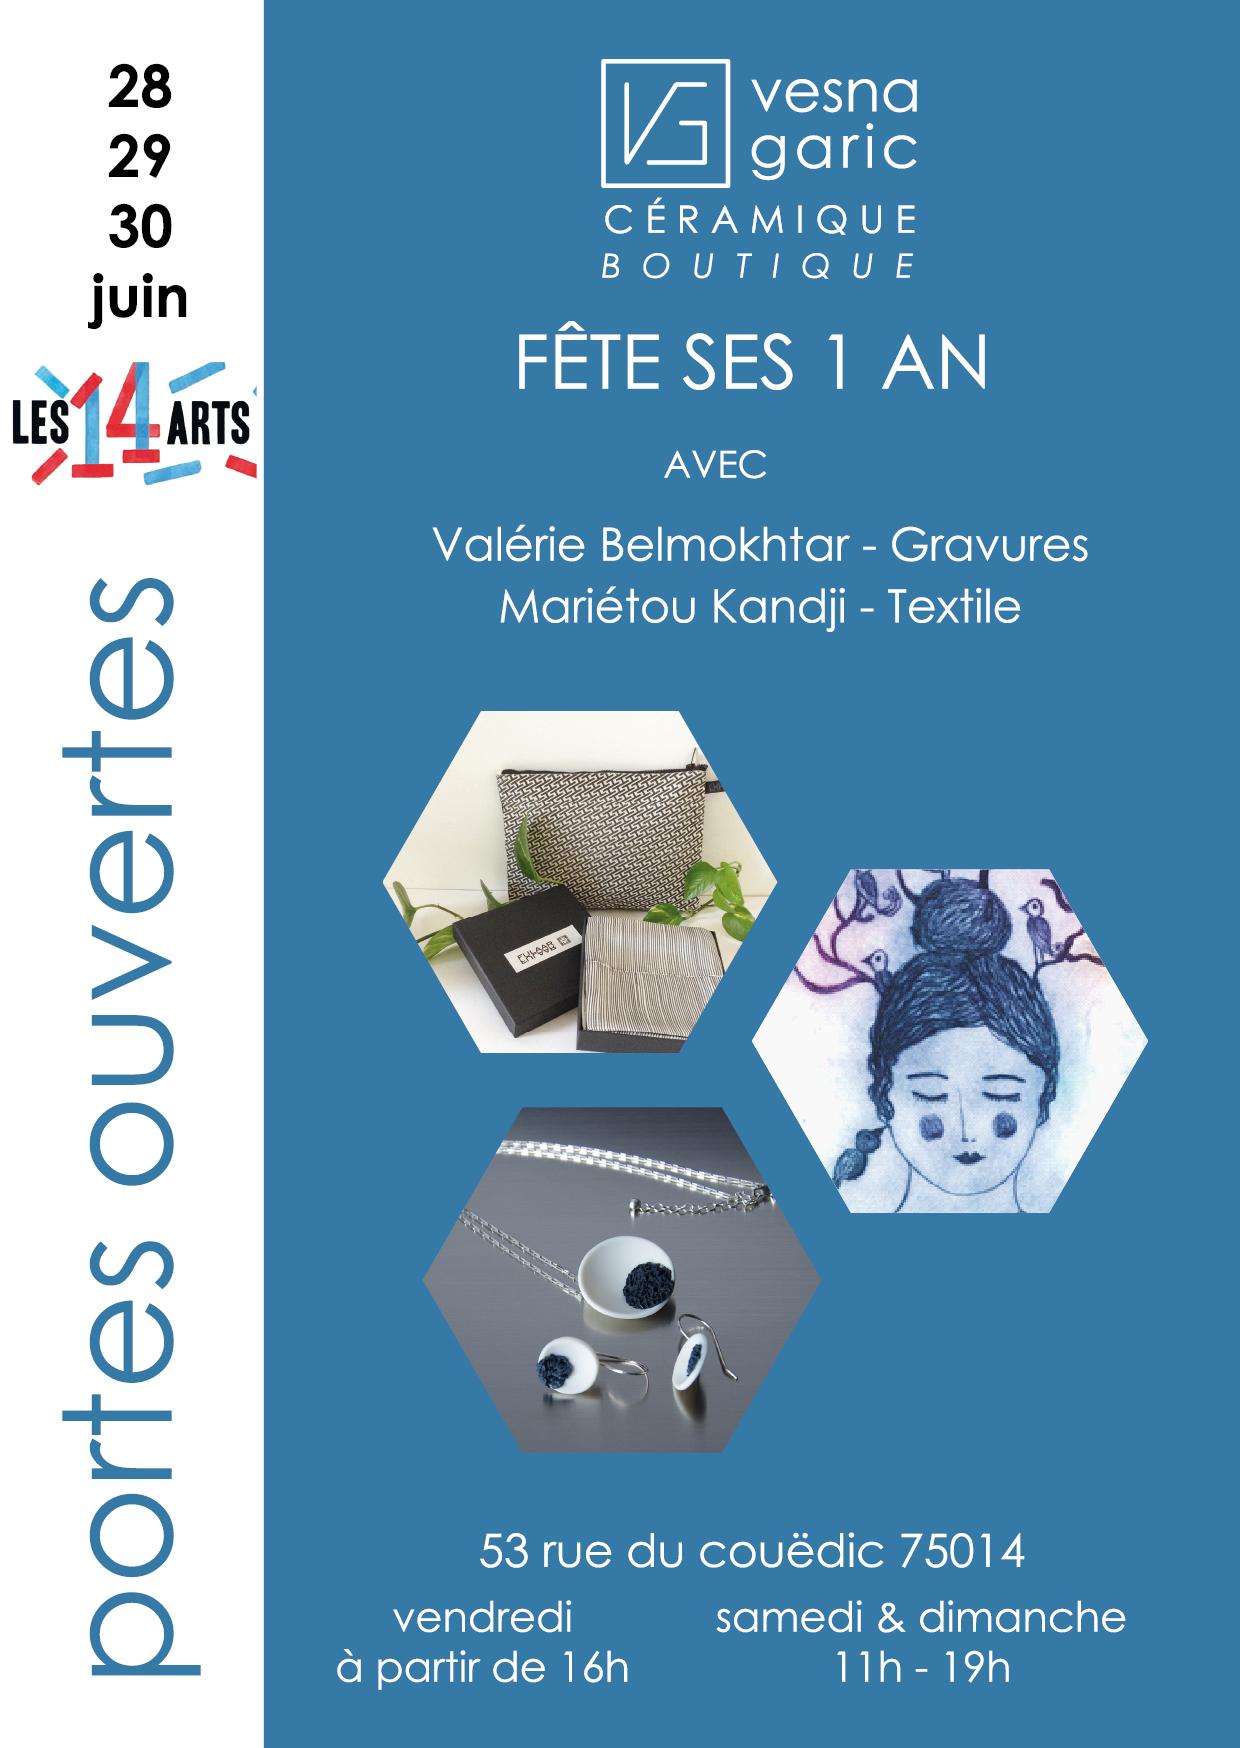 Flyer Anniversaire 14 ARTS